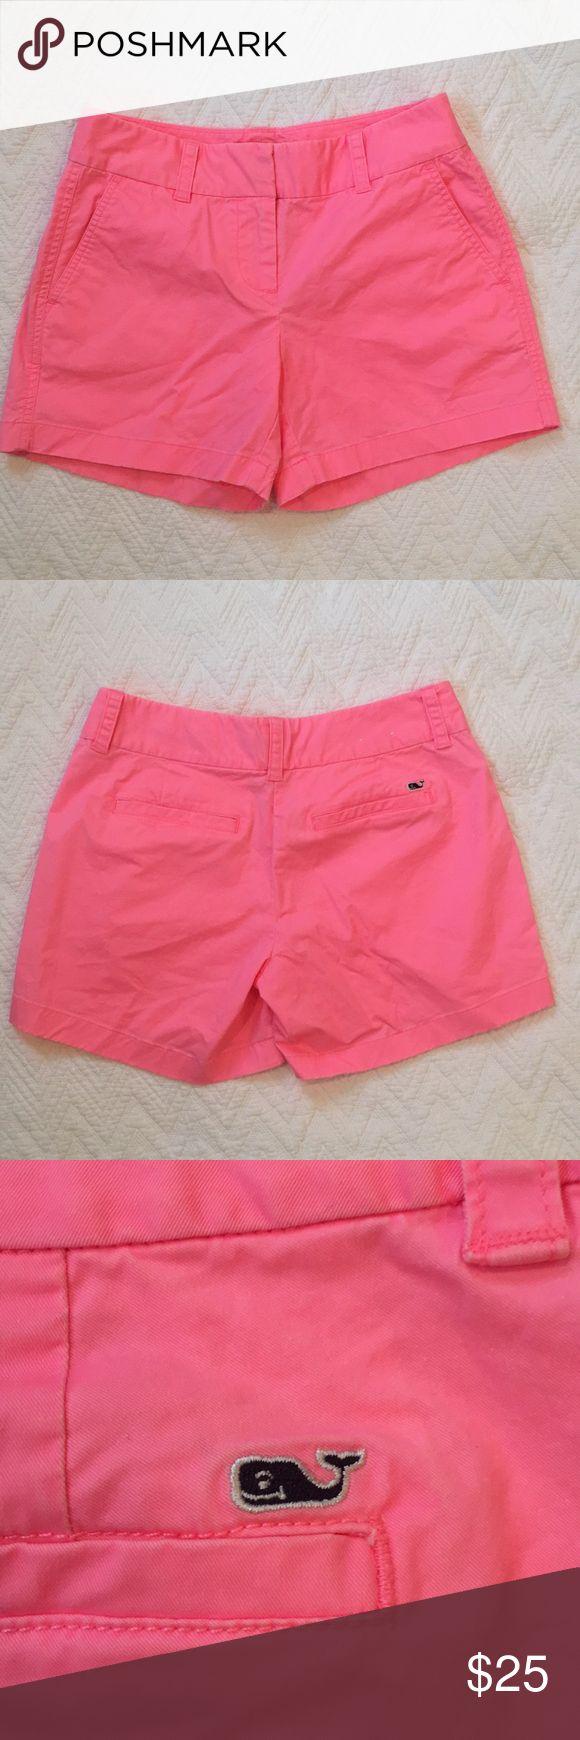 Vineyard Vines hot pink shorts, size 0 Vineyard Vines 5 Inch Every Day shorts. Hot pink, size 0. Excellent condition. Vineyard Vines Shorts